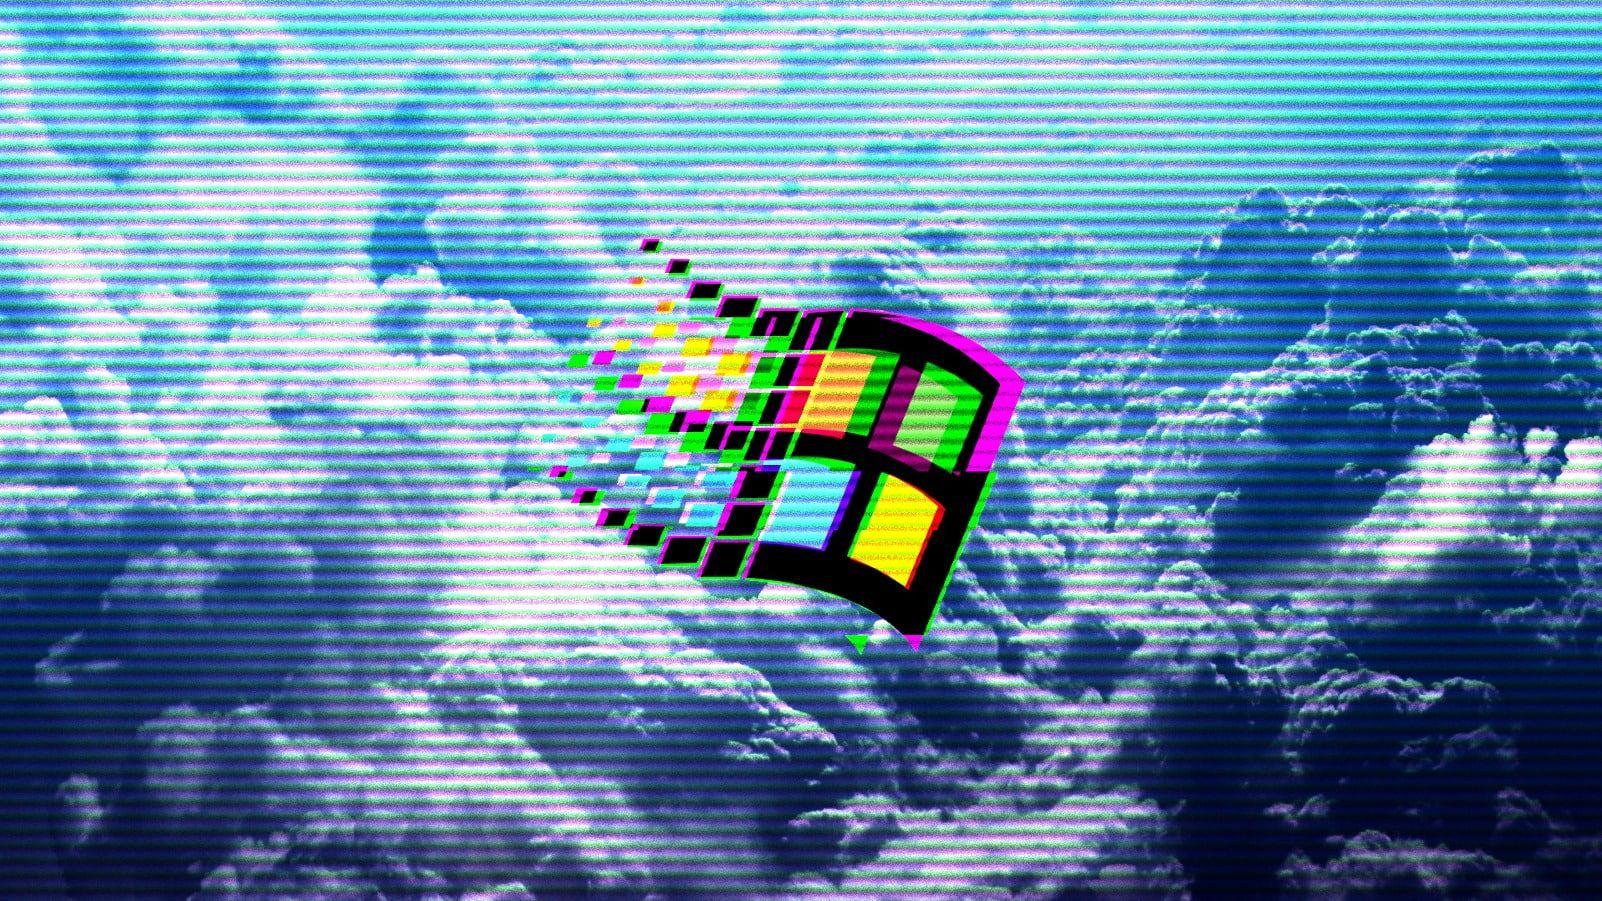 Vaporwave 1990s Windows 95 Windows 98 Clouds 720p Wallpaper Hdwallpaper Desktop Vaporwave Wallpaper Hd Wallpaper Vaporwave